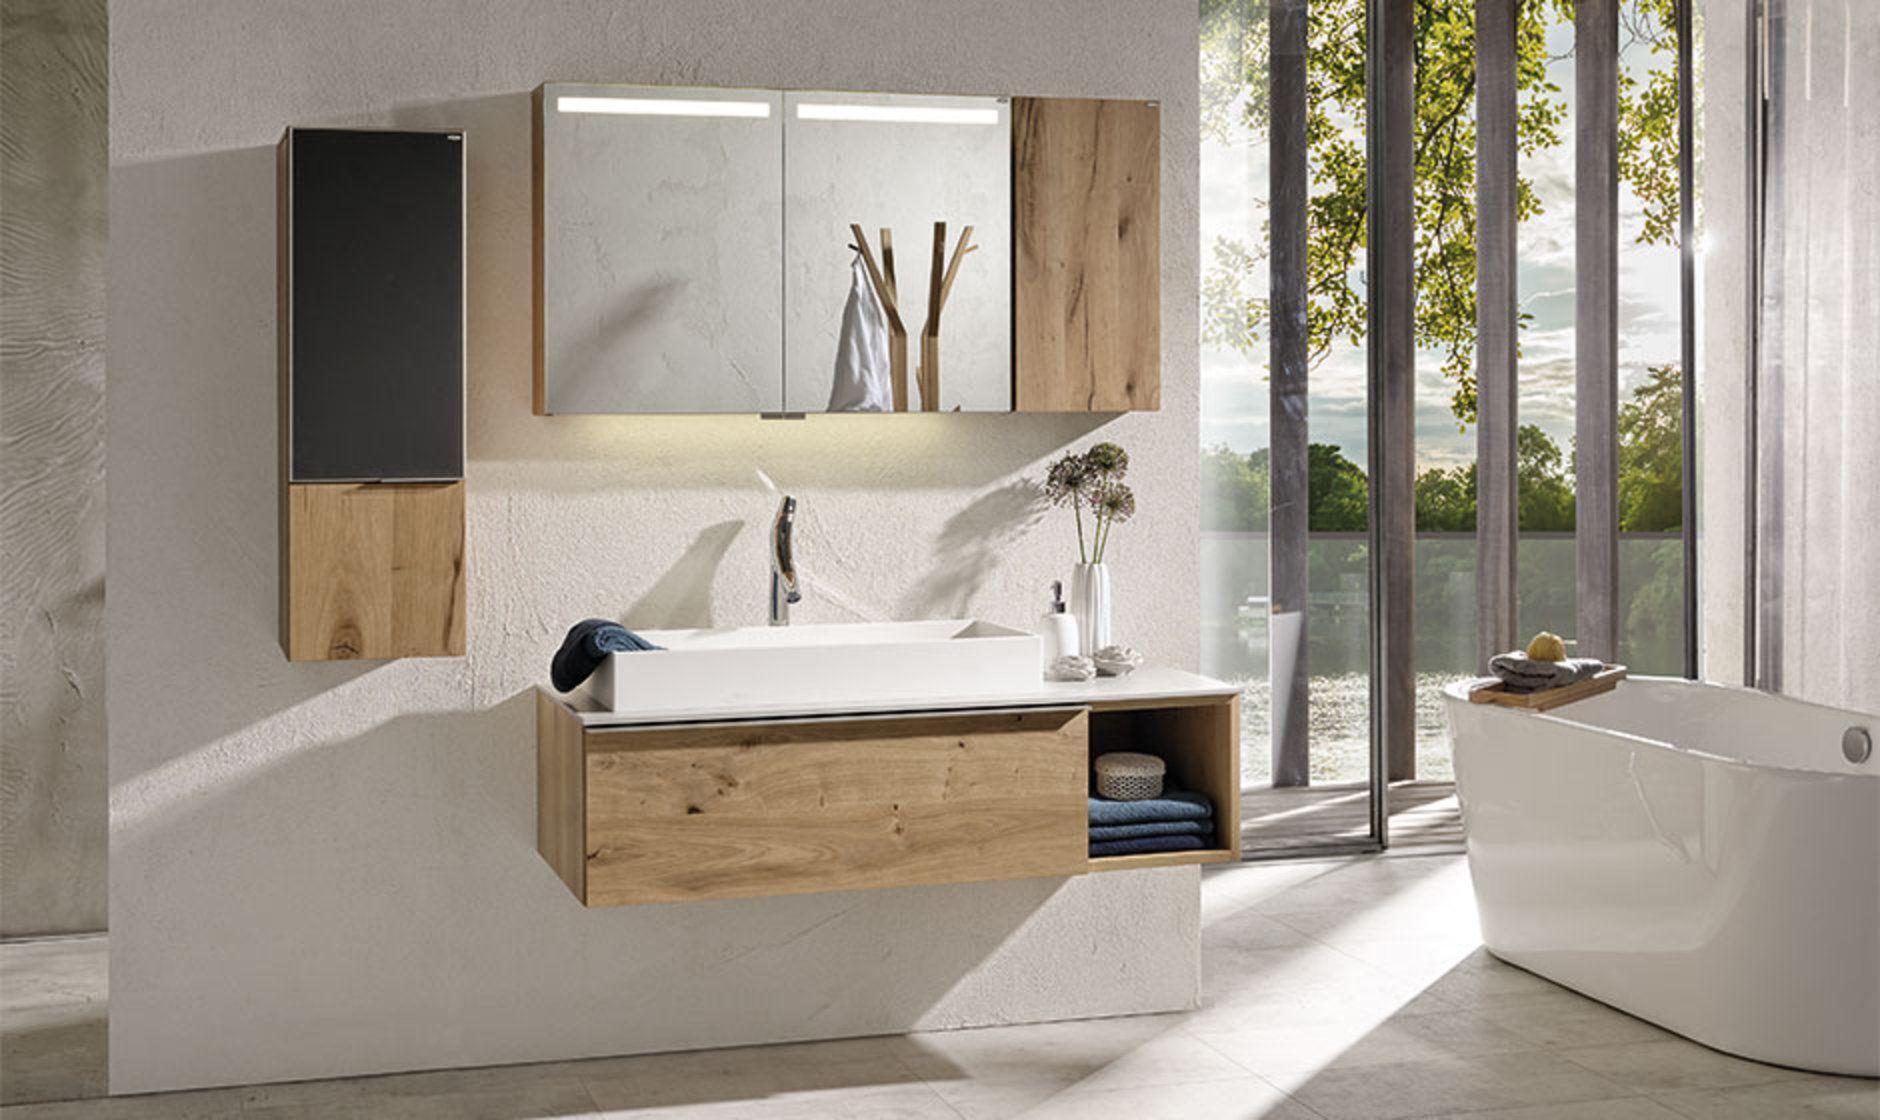 Designer Badezimmermöbel designer badezimmermöbel v alpin badezimmermöbel voglauer